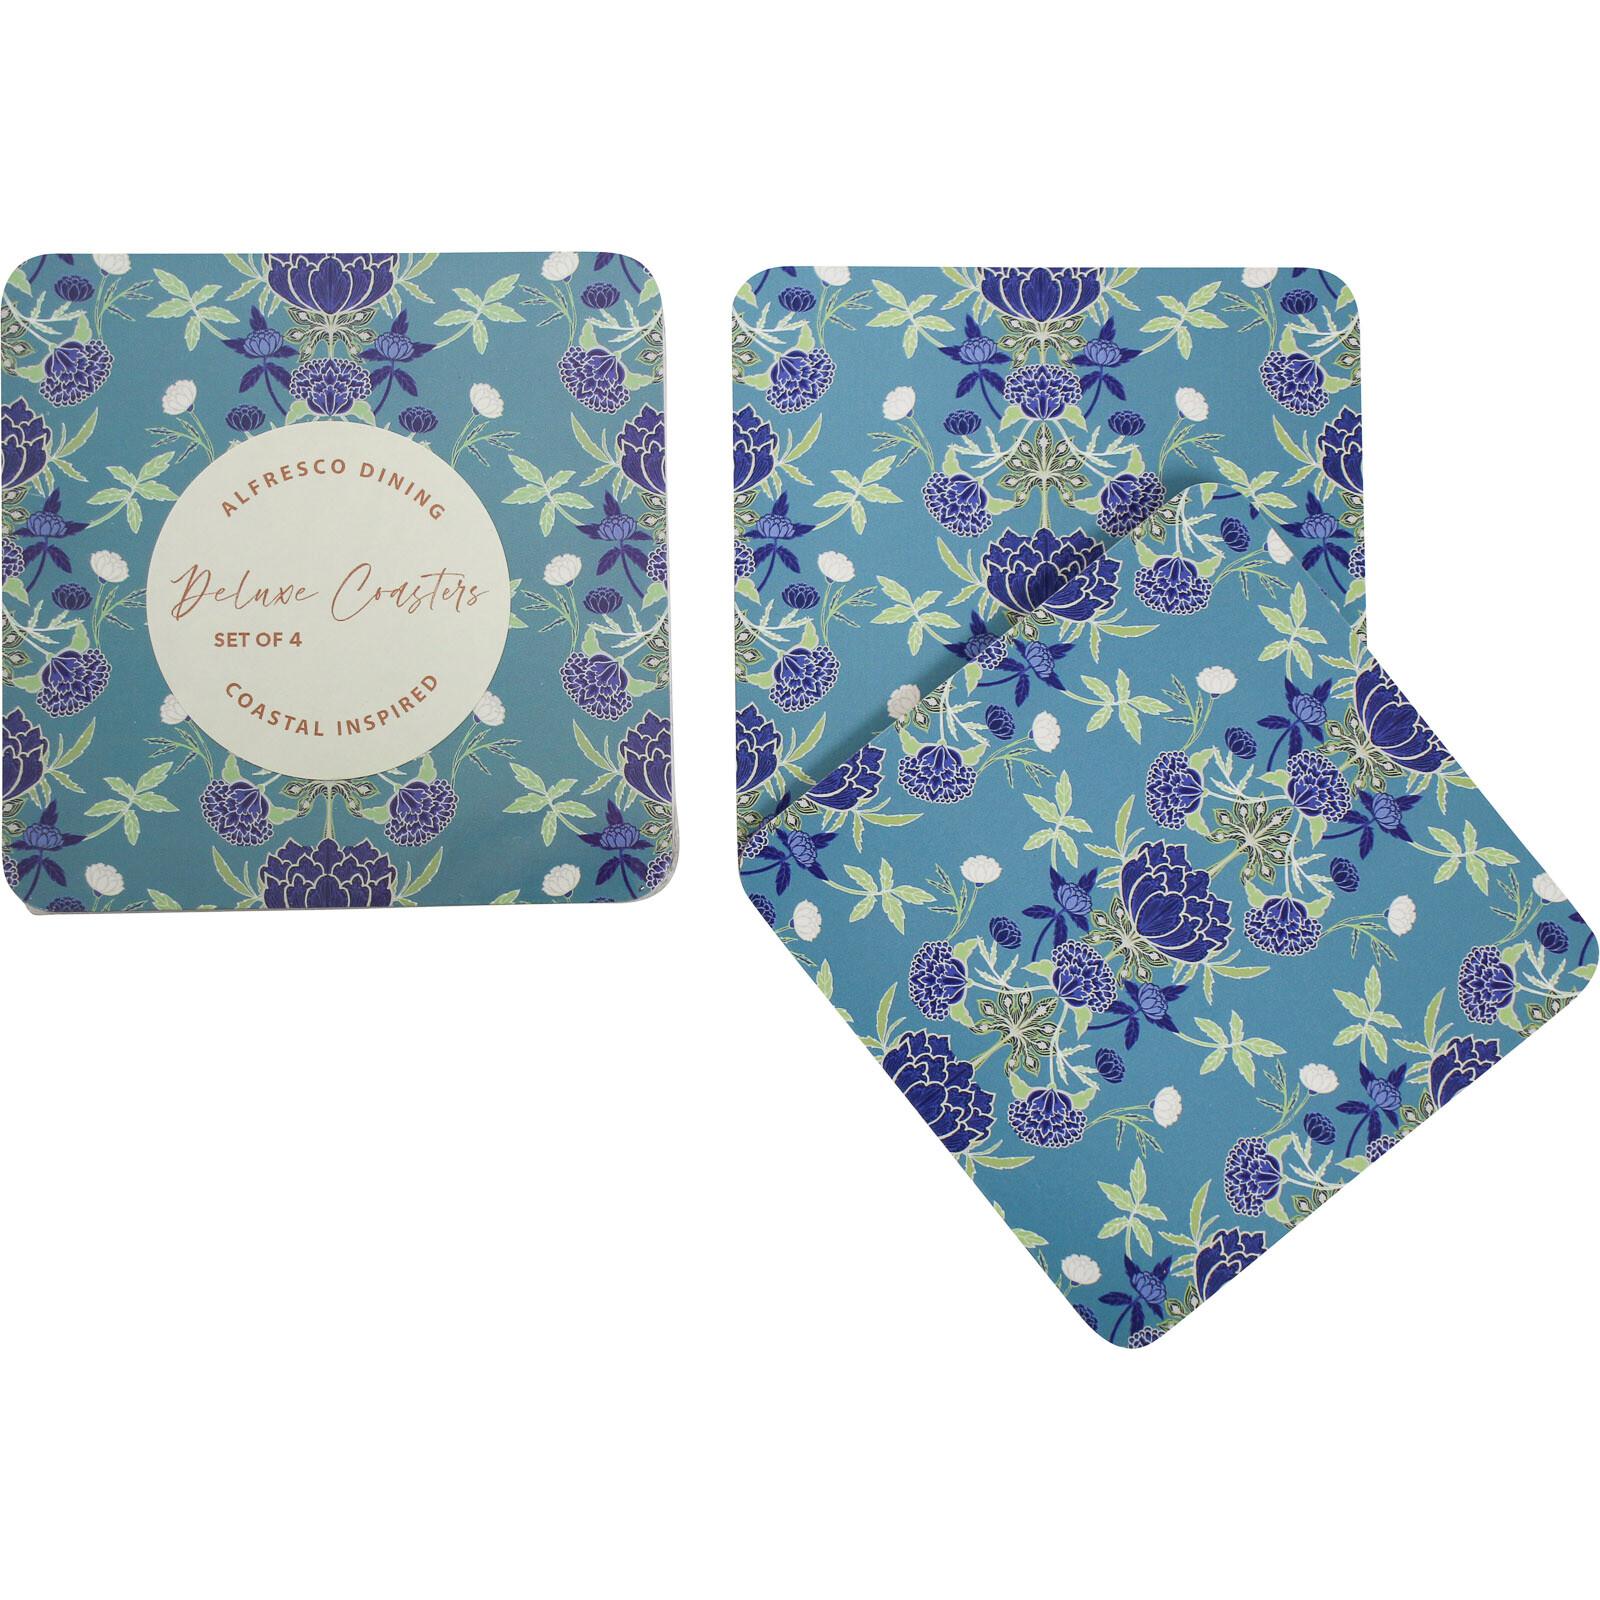 Coaster WilliamMorrisBohemian Floral S/4